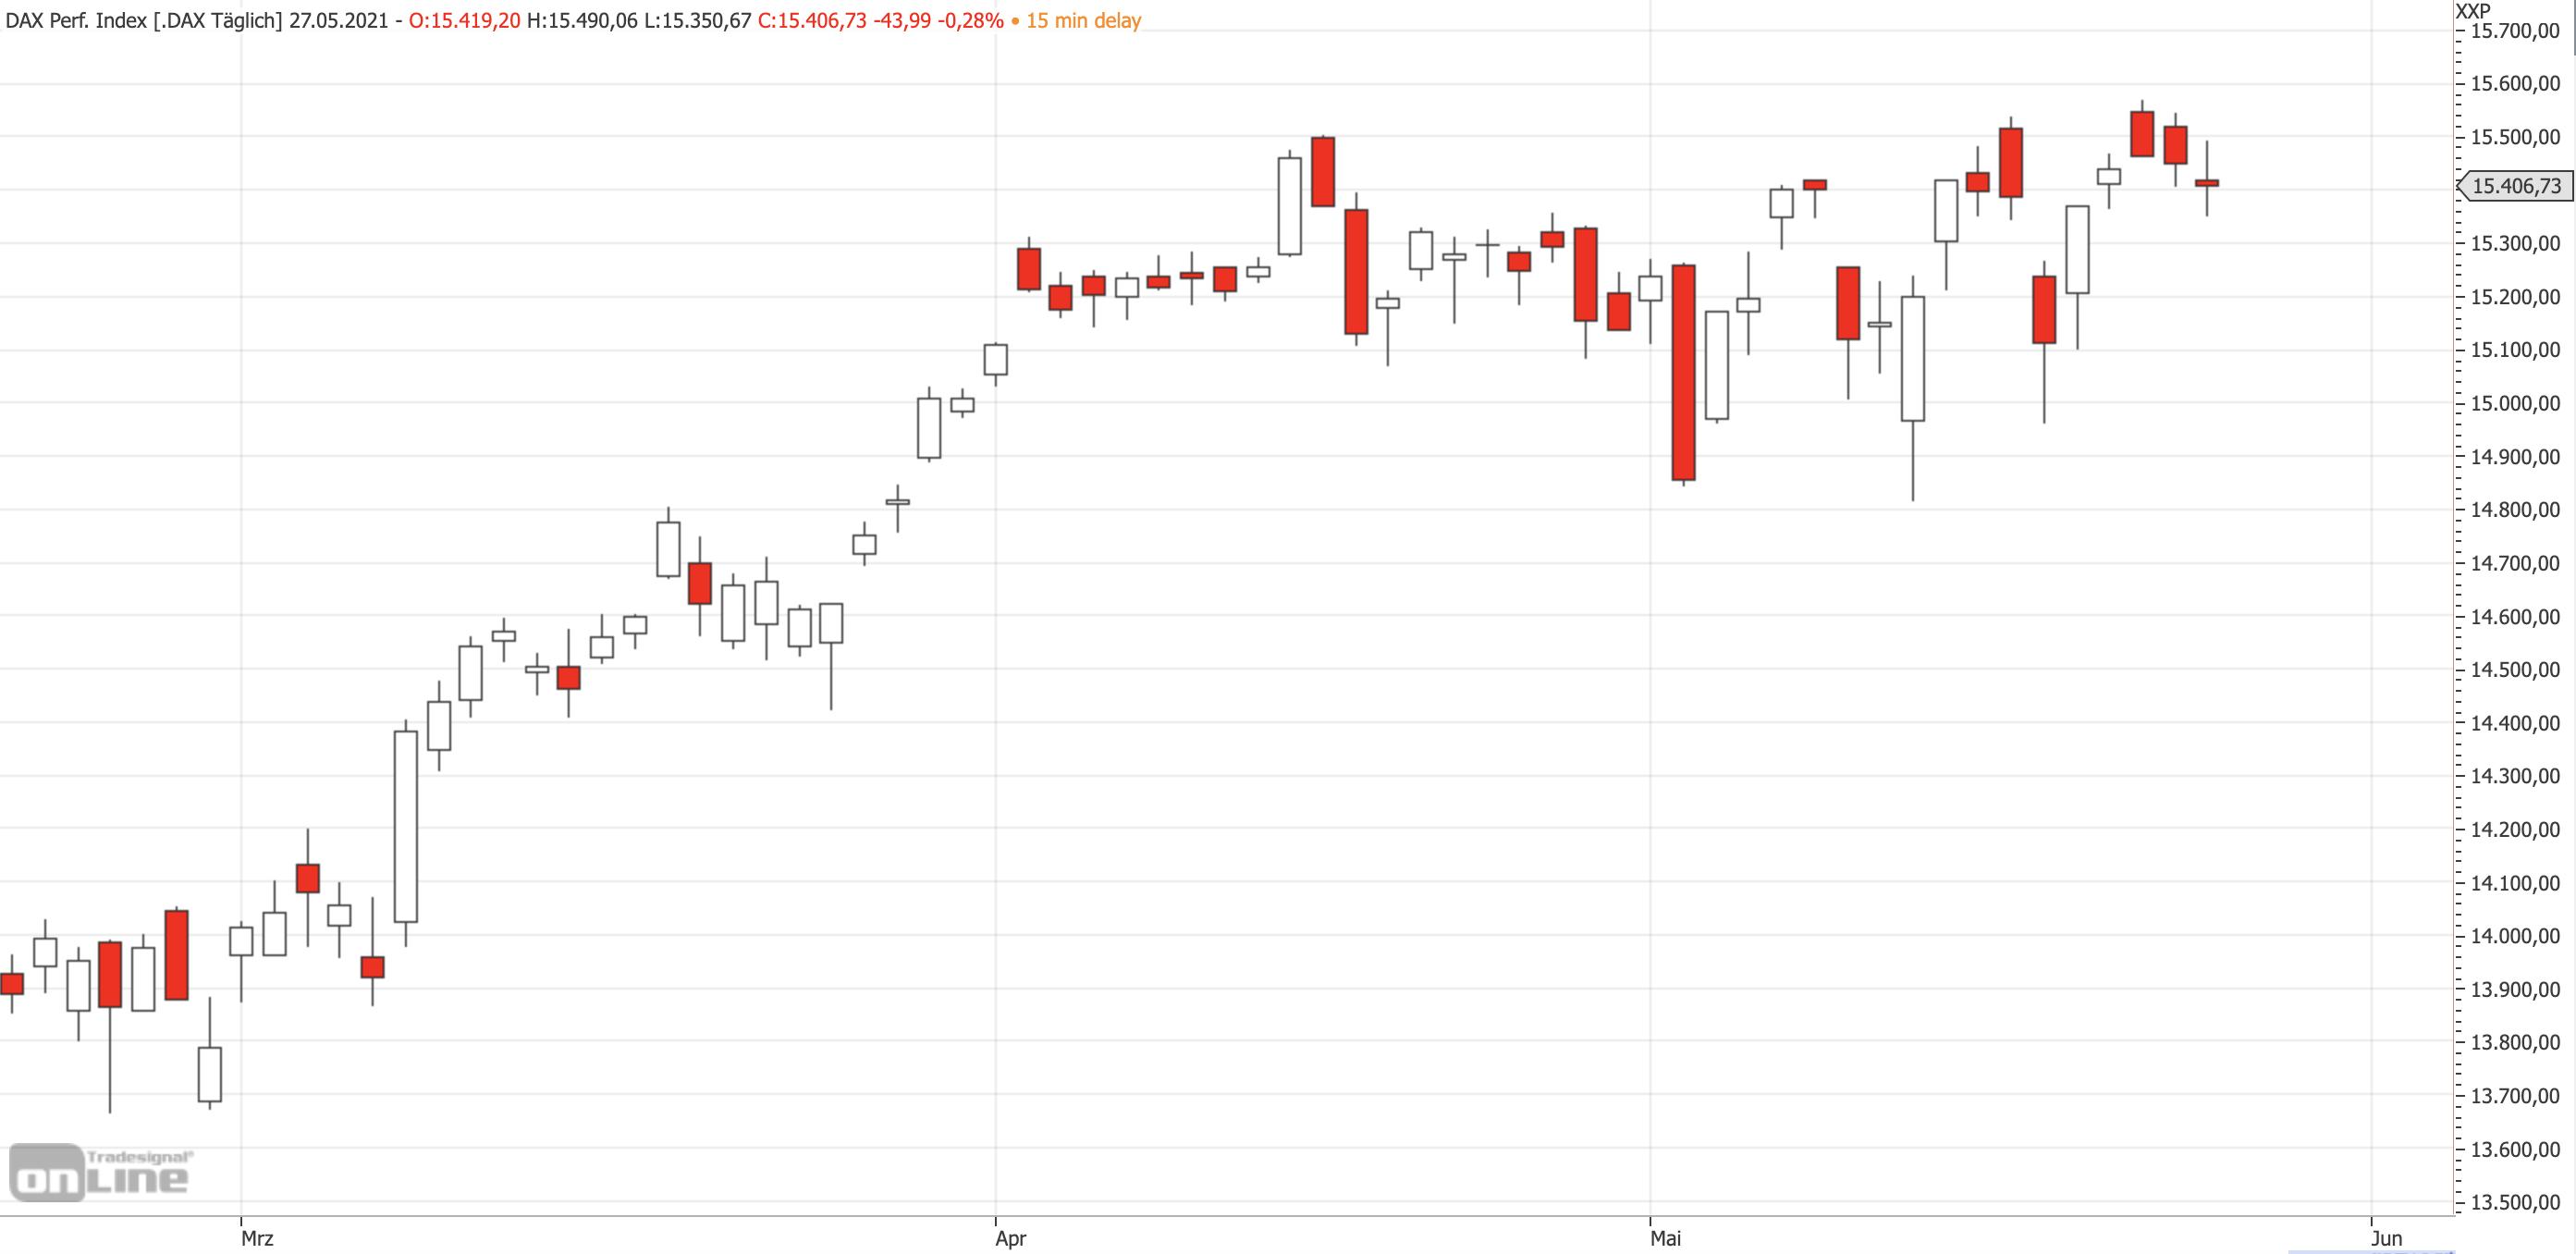 Mittelfristiger DAX-Chart am 27.05.2021